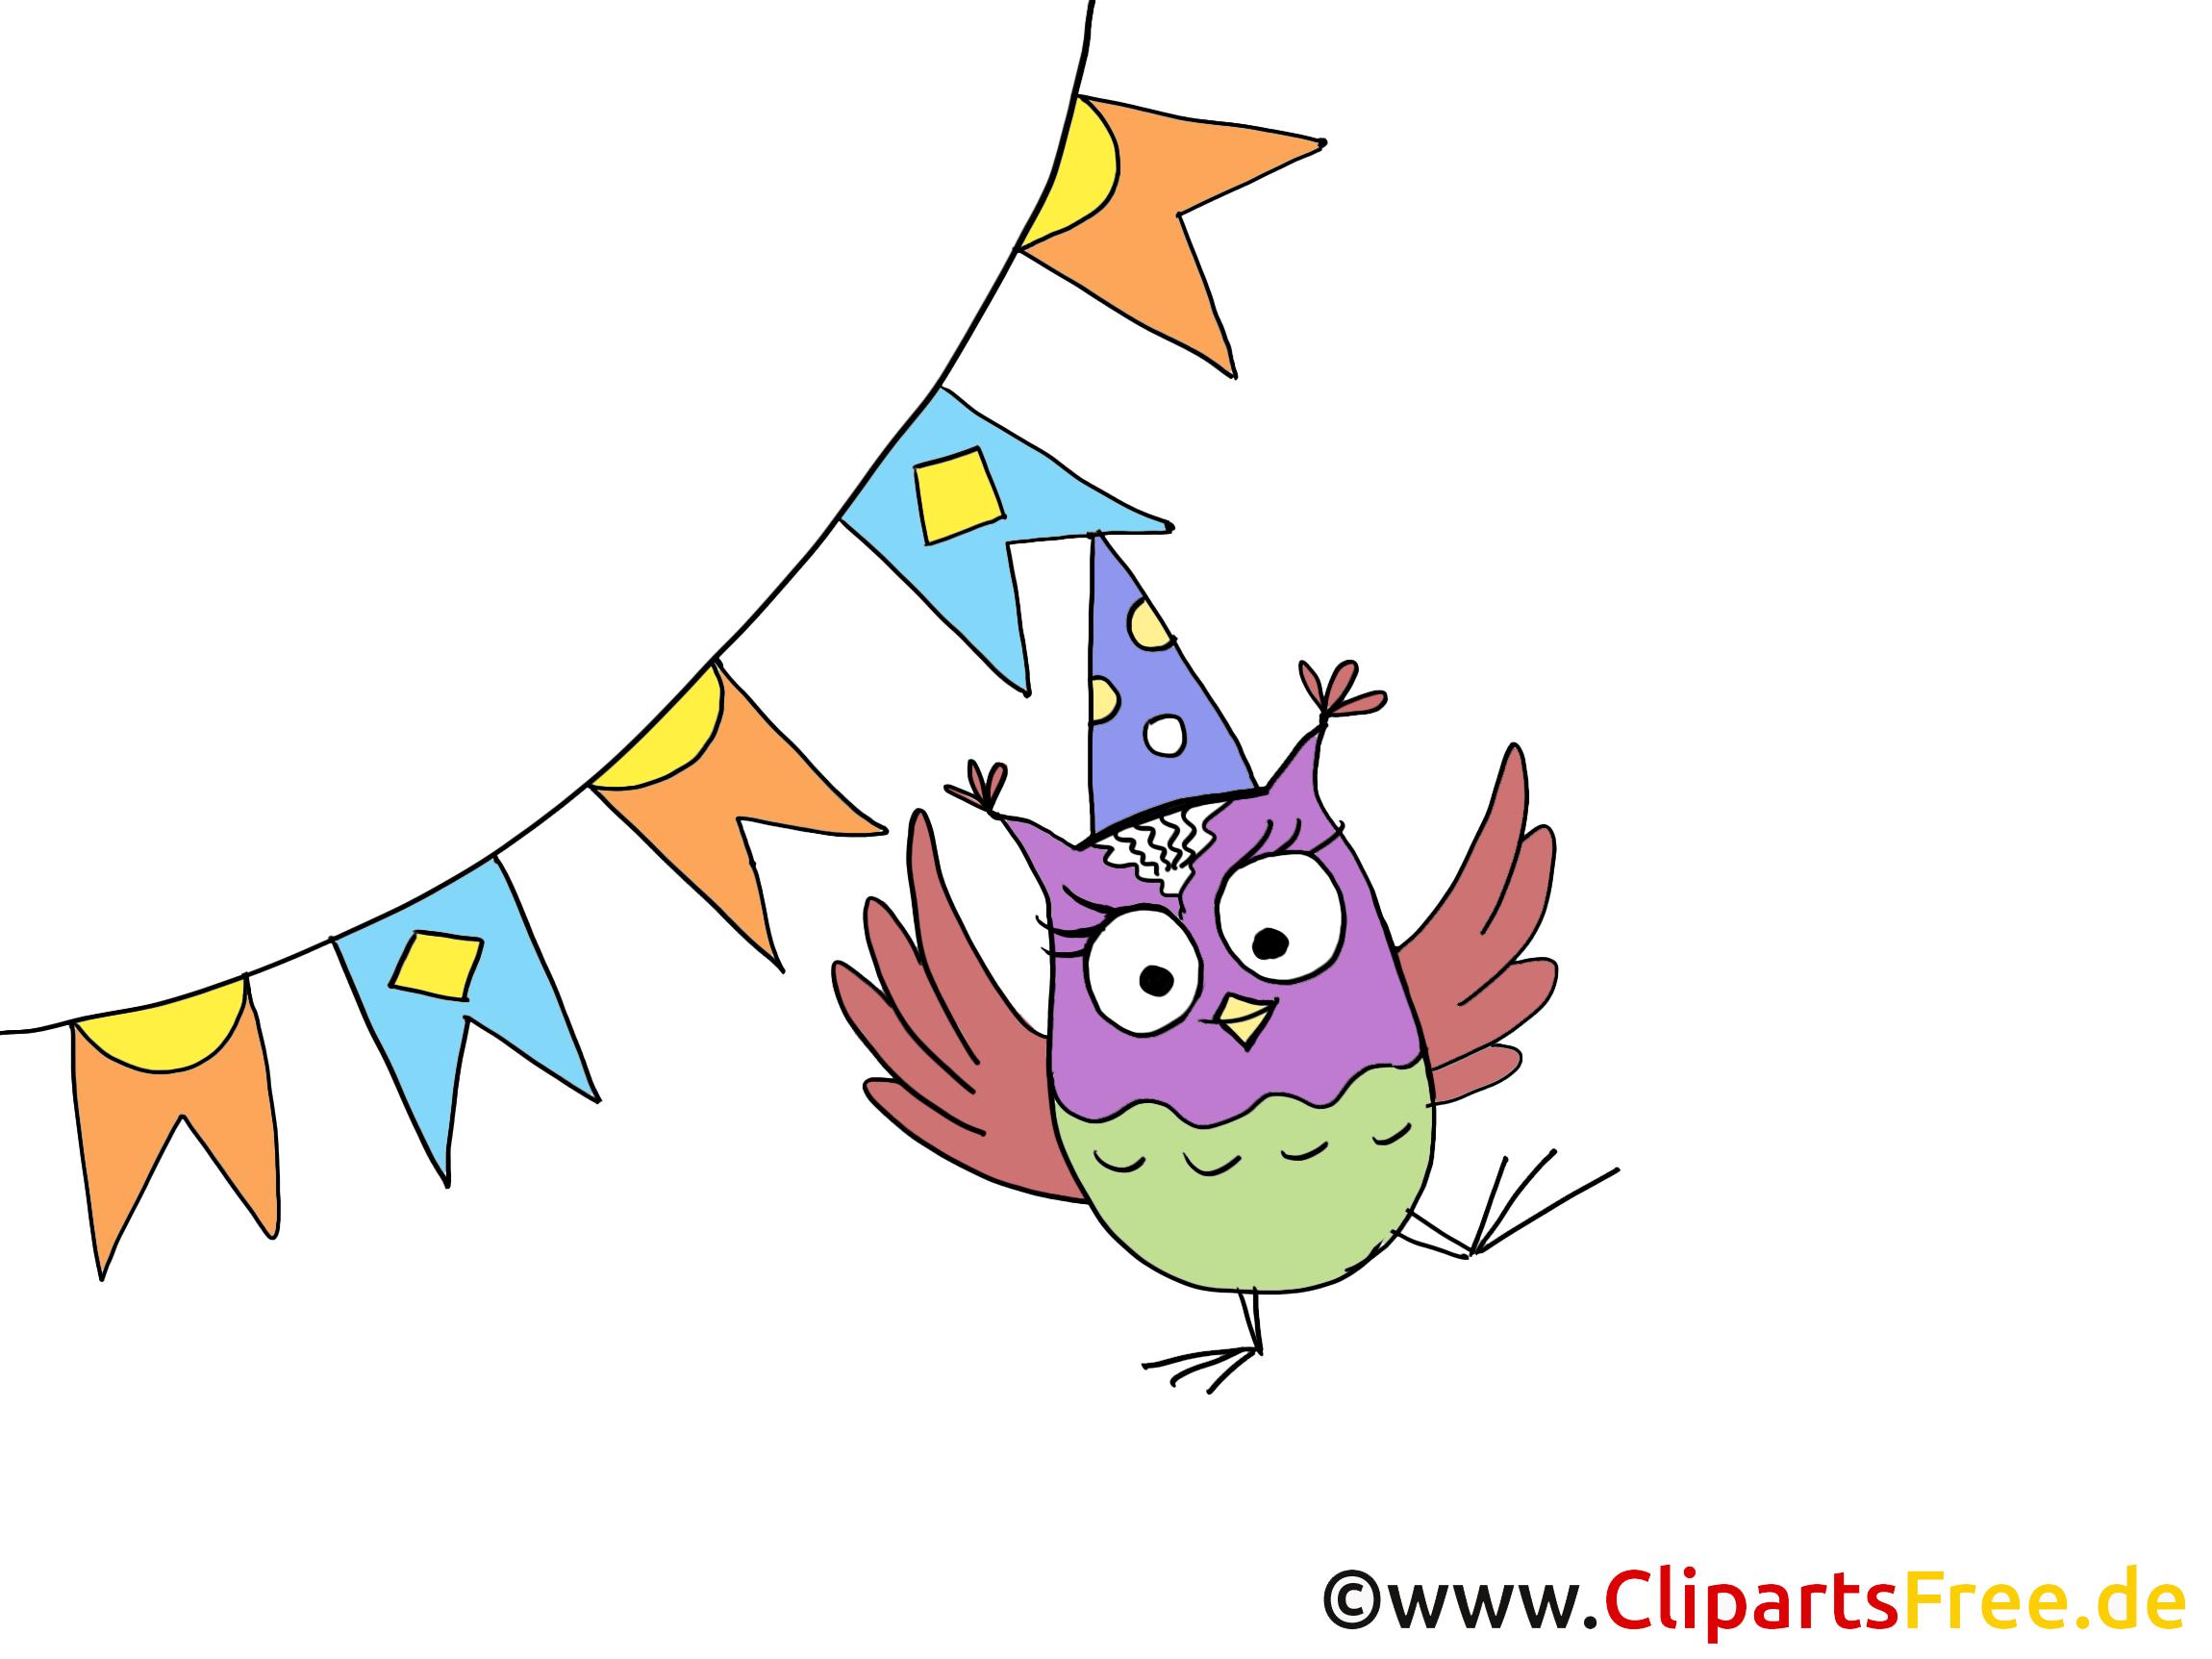 Hibou illustration - Fête images gratuites